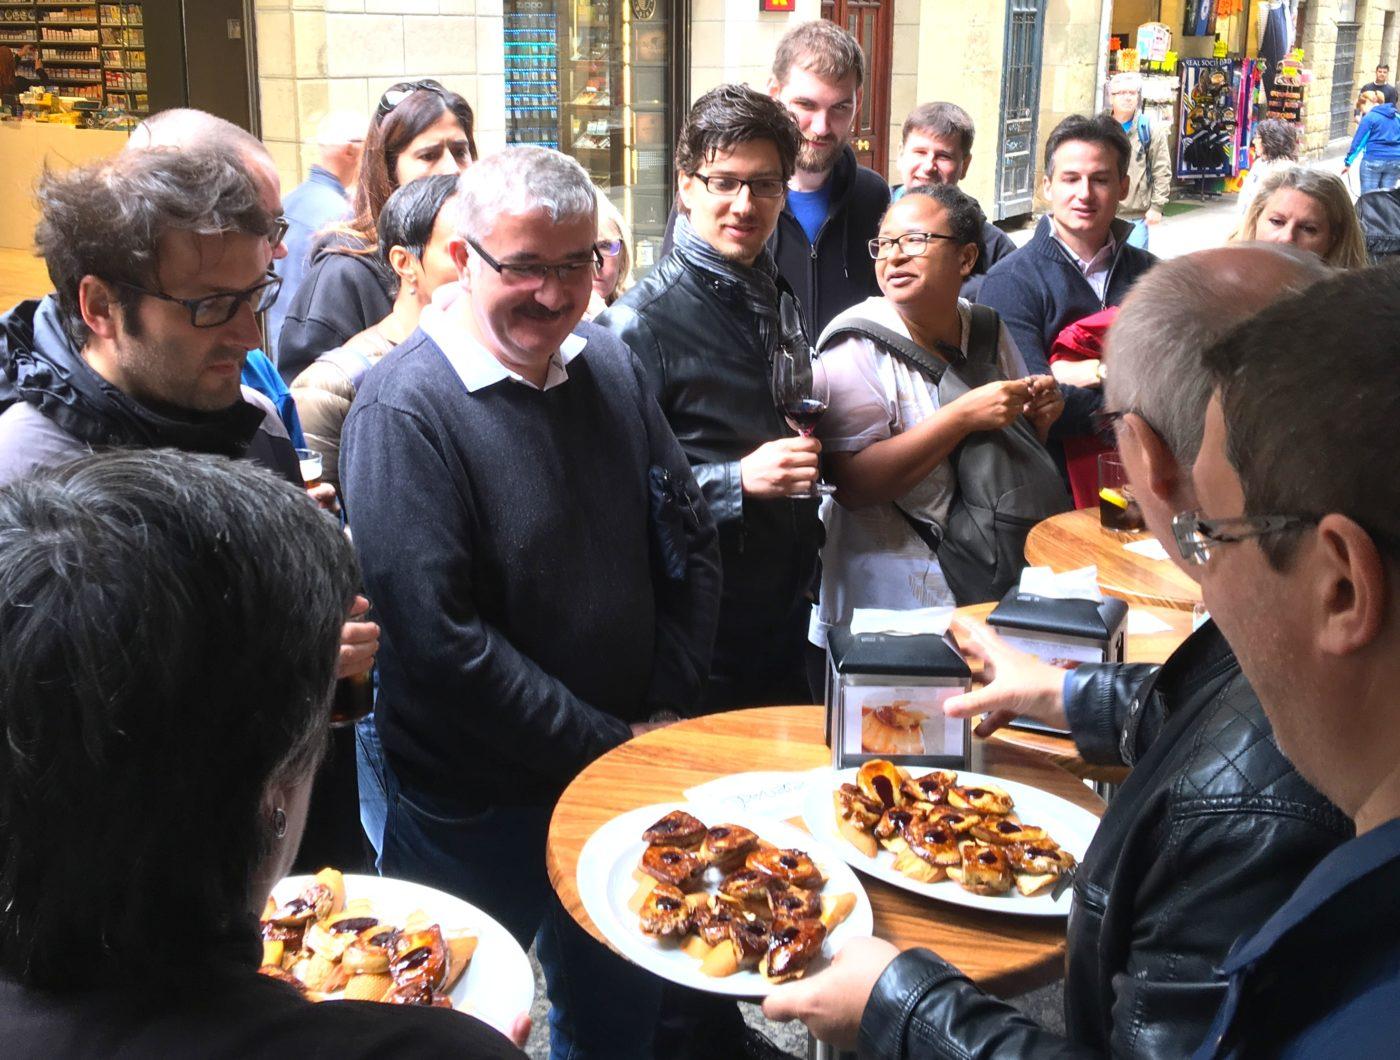 Seminaire Pays Basque erronda agence evenementielle biarritz hendaye Saint sebastien surf initiation pelote basque tapas societe gastronomique croisiere regate-1